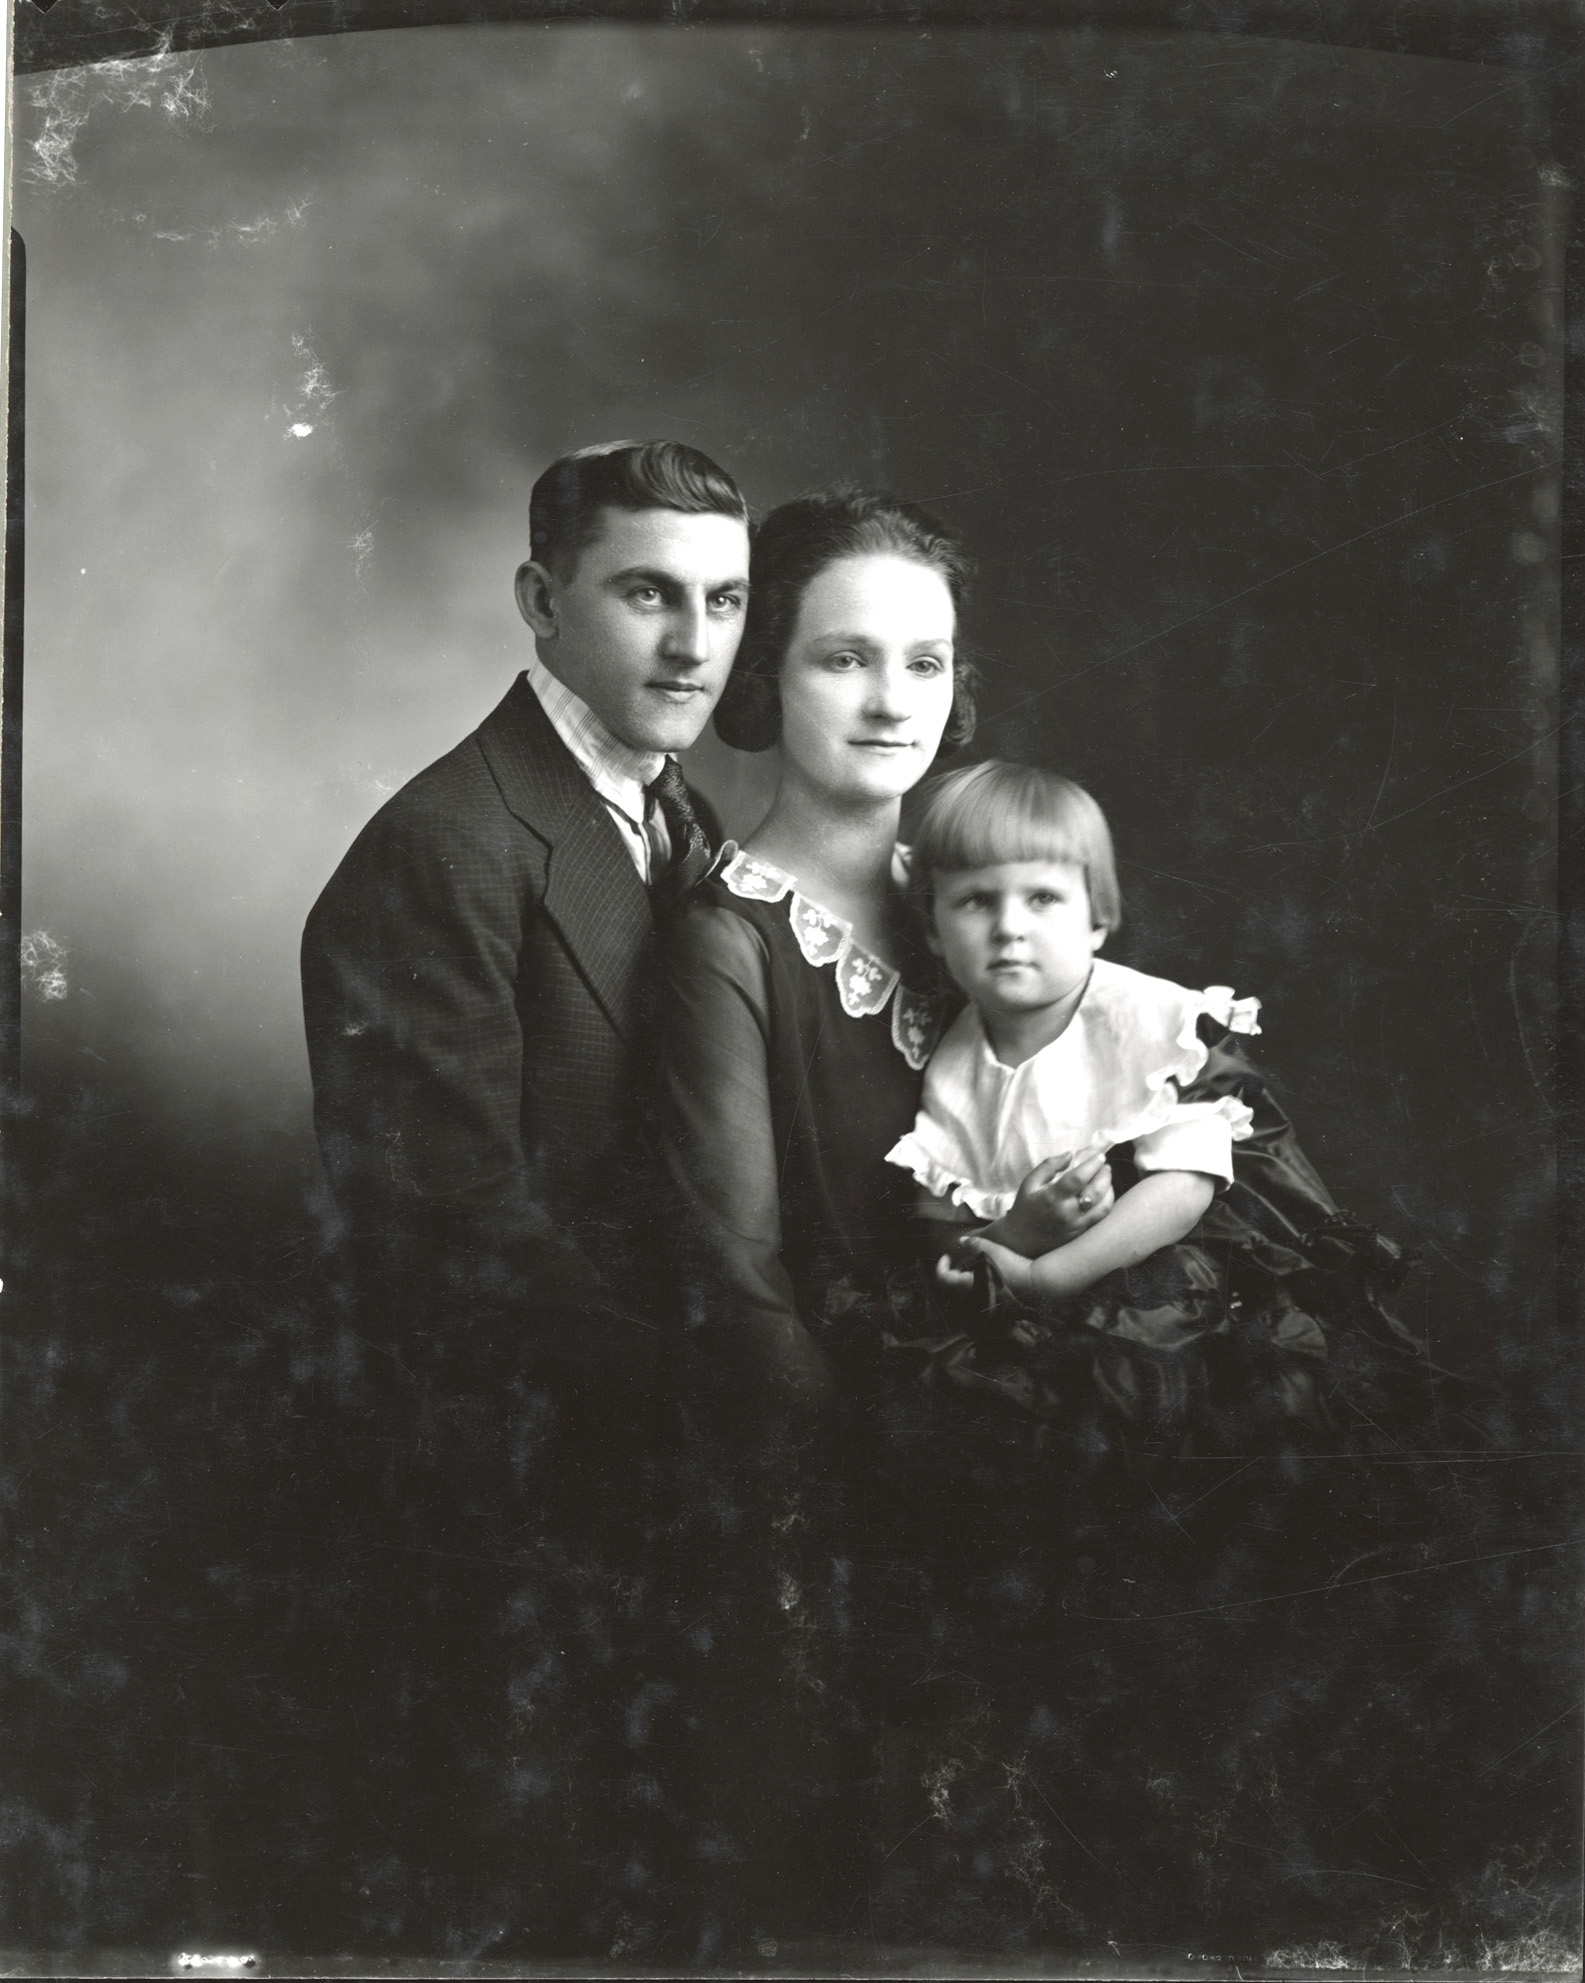 Oberg's 1920